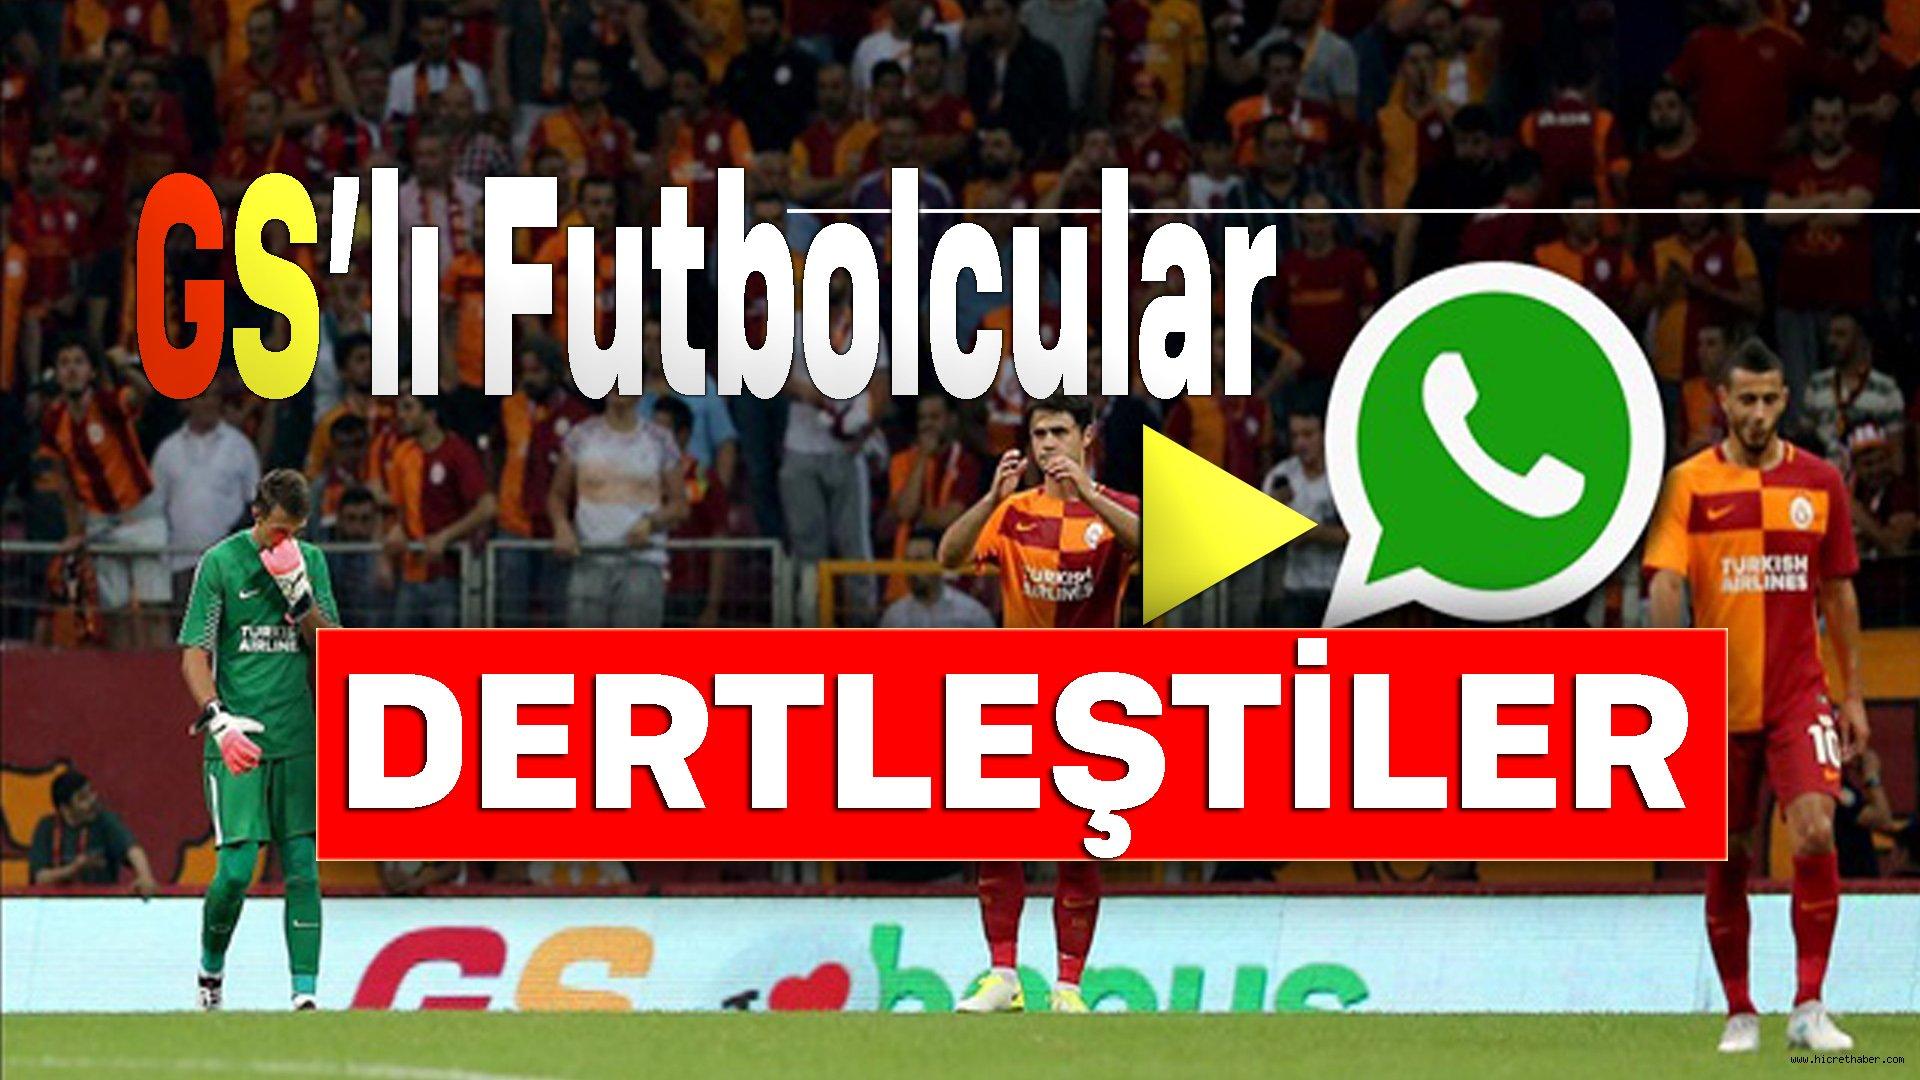 GS'lı Futbolcular WhatsApp'tan Dertleşti